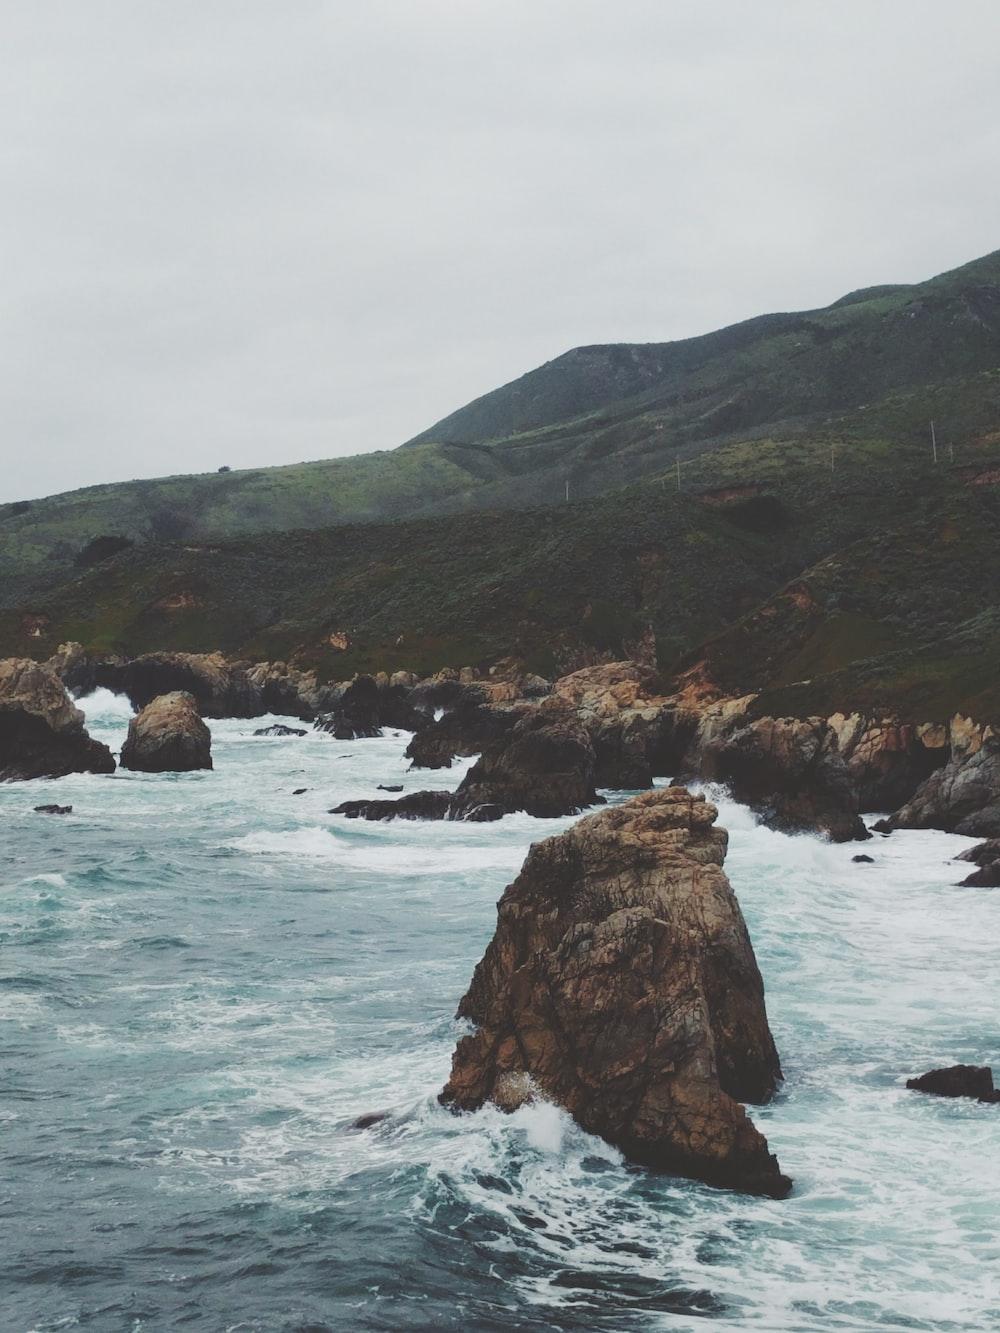 brown rock on body of water near mountain